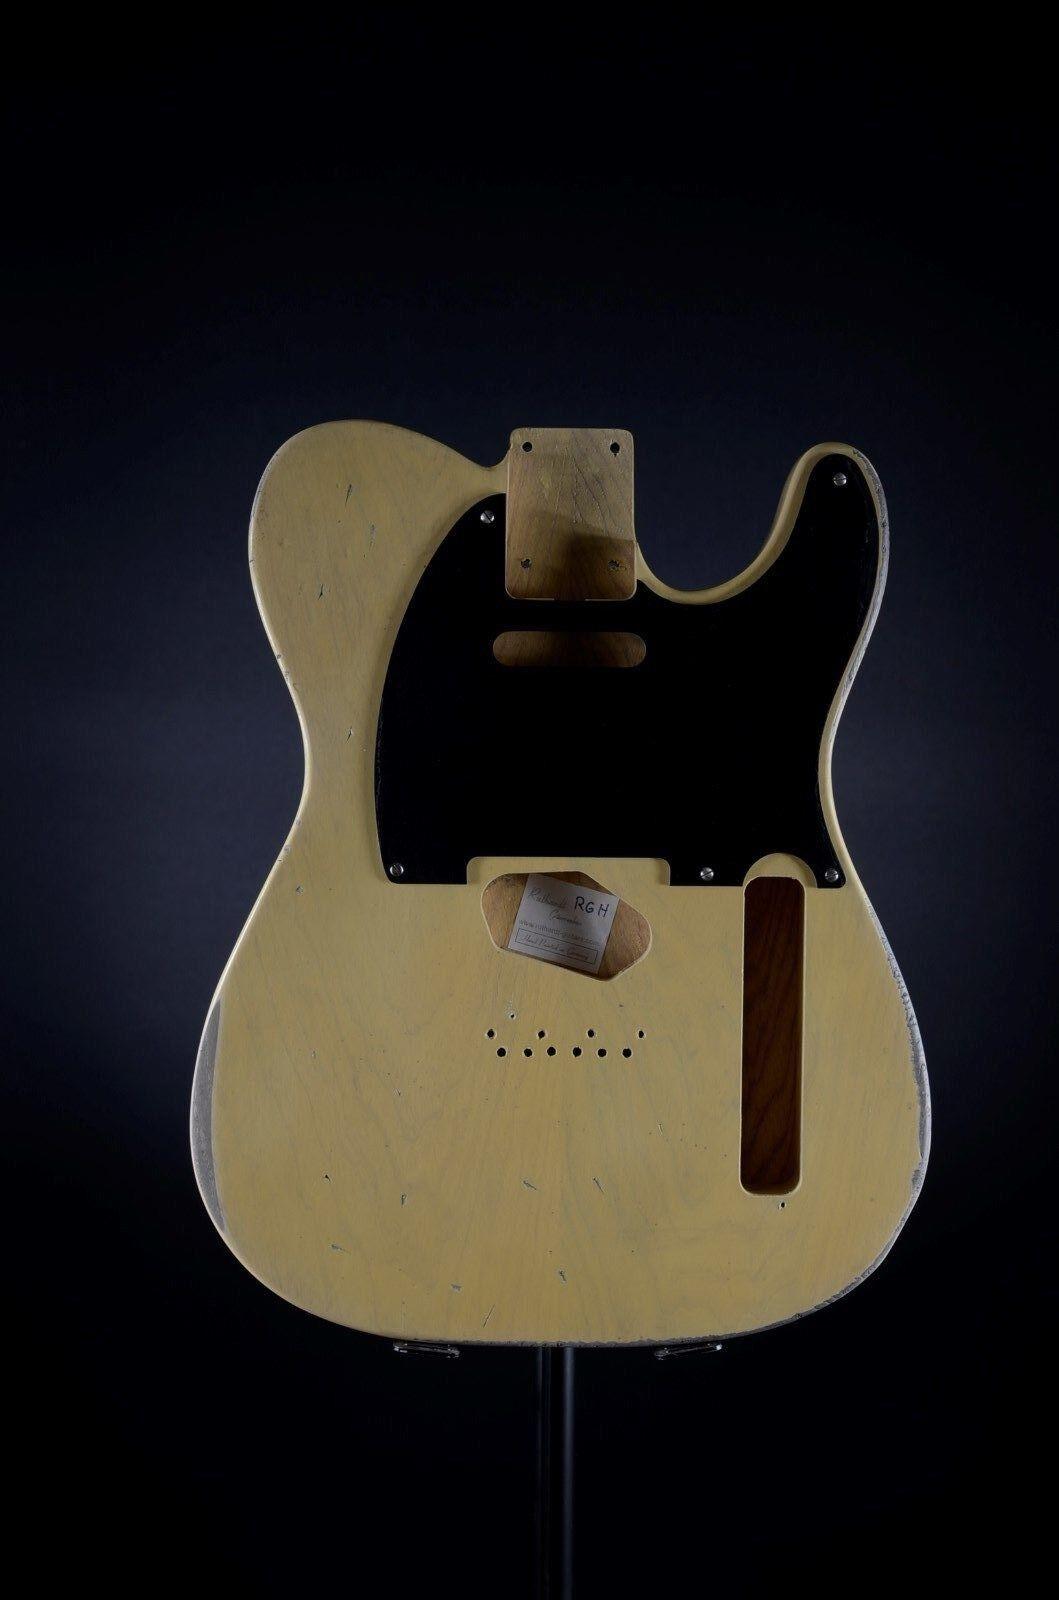 RGH   Tele Style Body Butterscotch  Swampash aged   relic  Nitro  + Bak. Pickg.